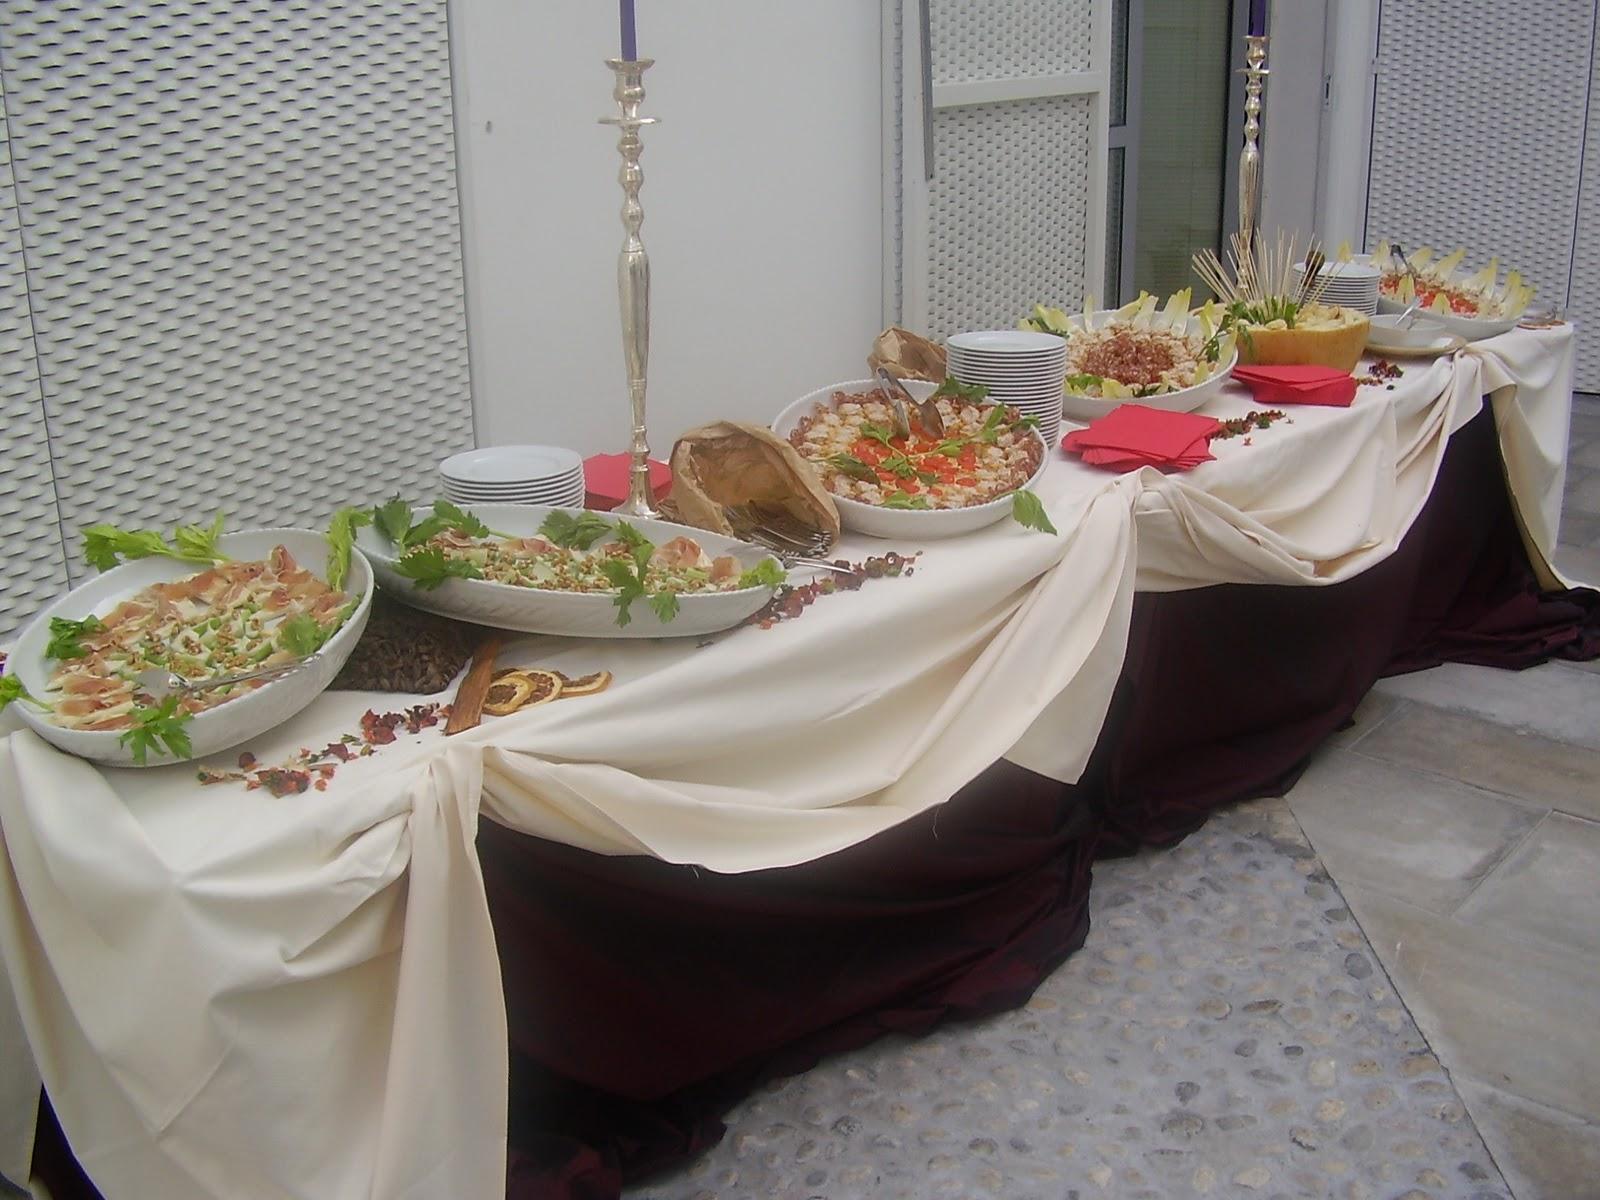 Luis atmospherae fine catering - Tavole apparecchiate per buffet ...